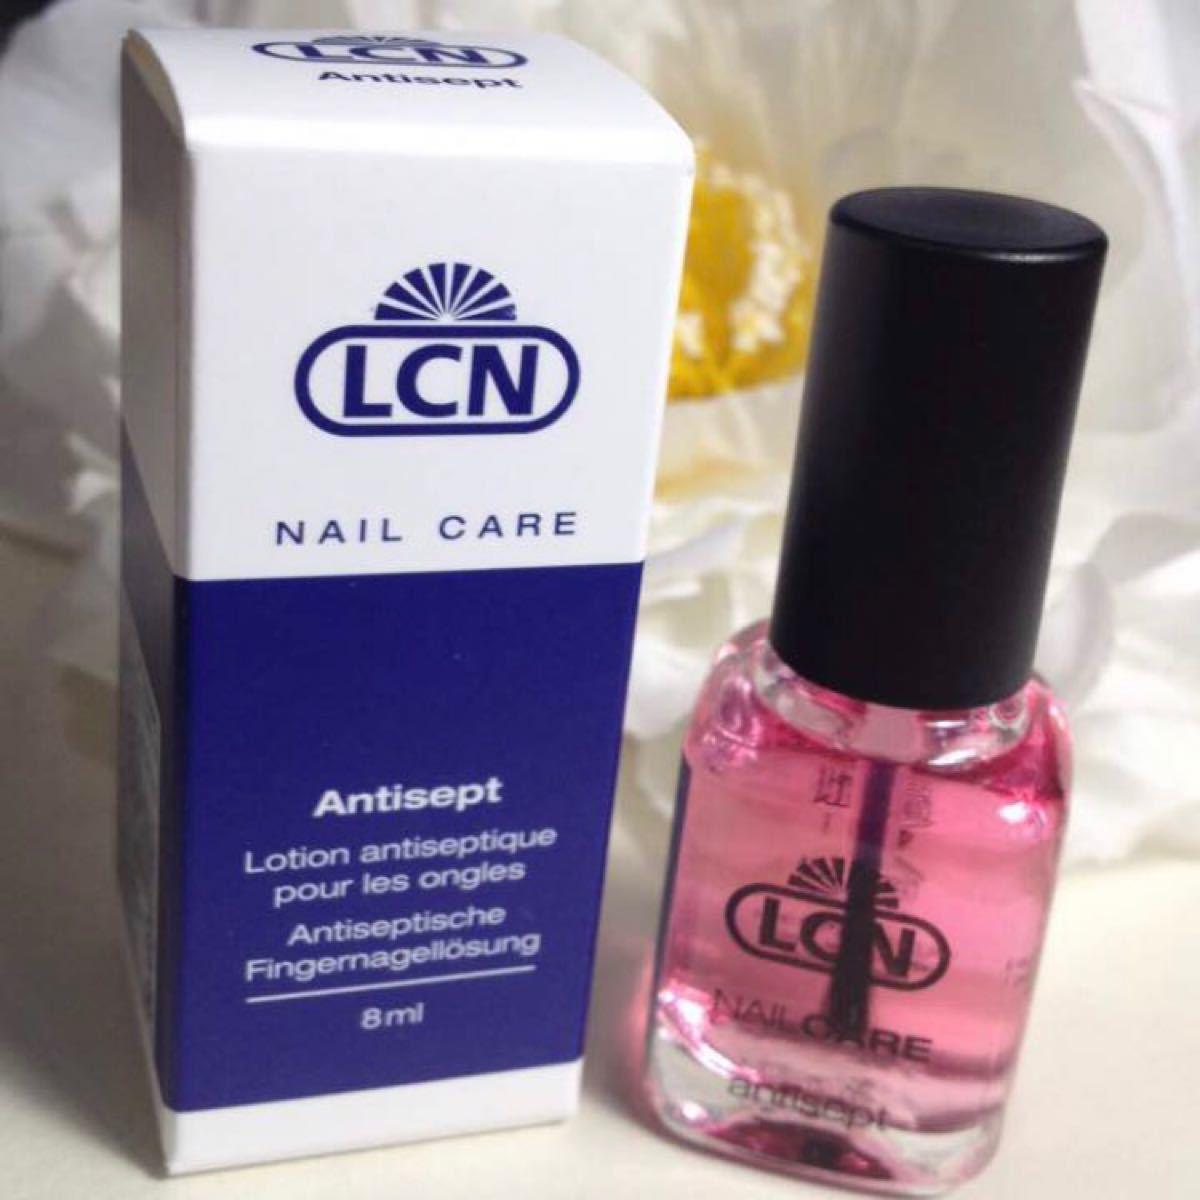 LCNアンティセプト・抗菌効果のあるキューティクルオイル・新品未使用未開封